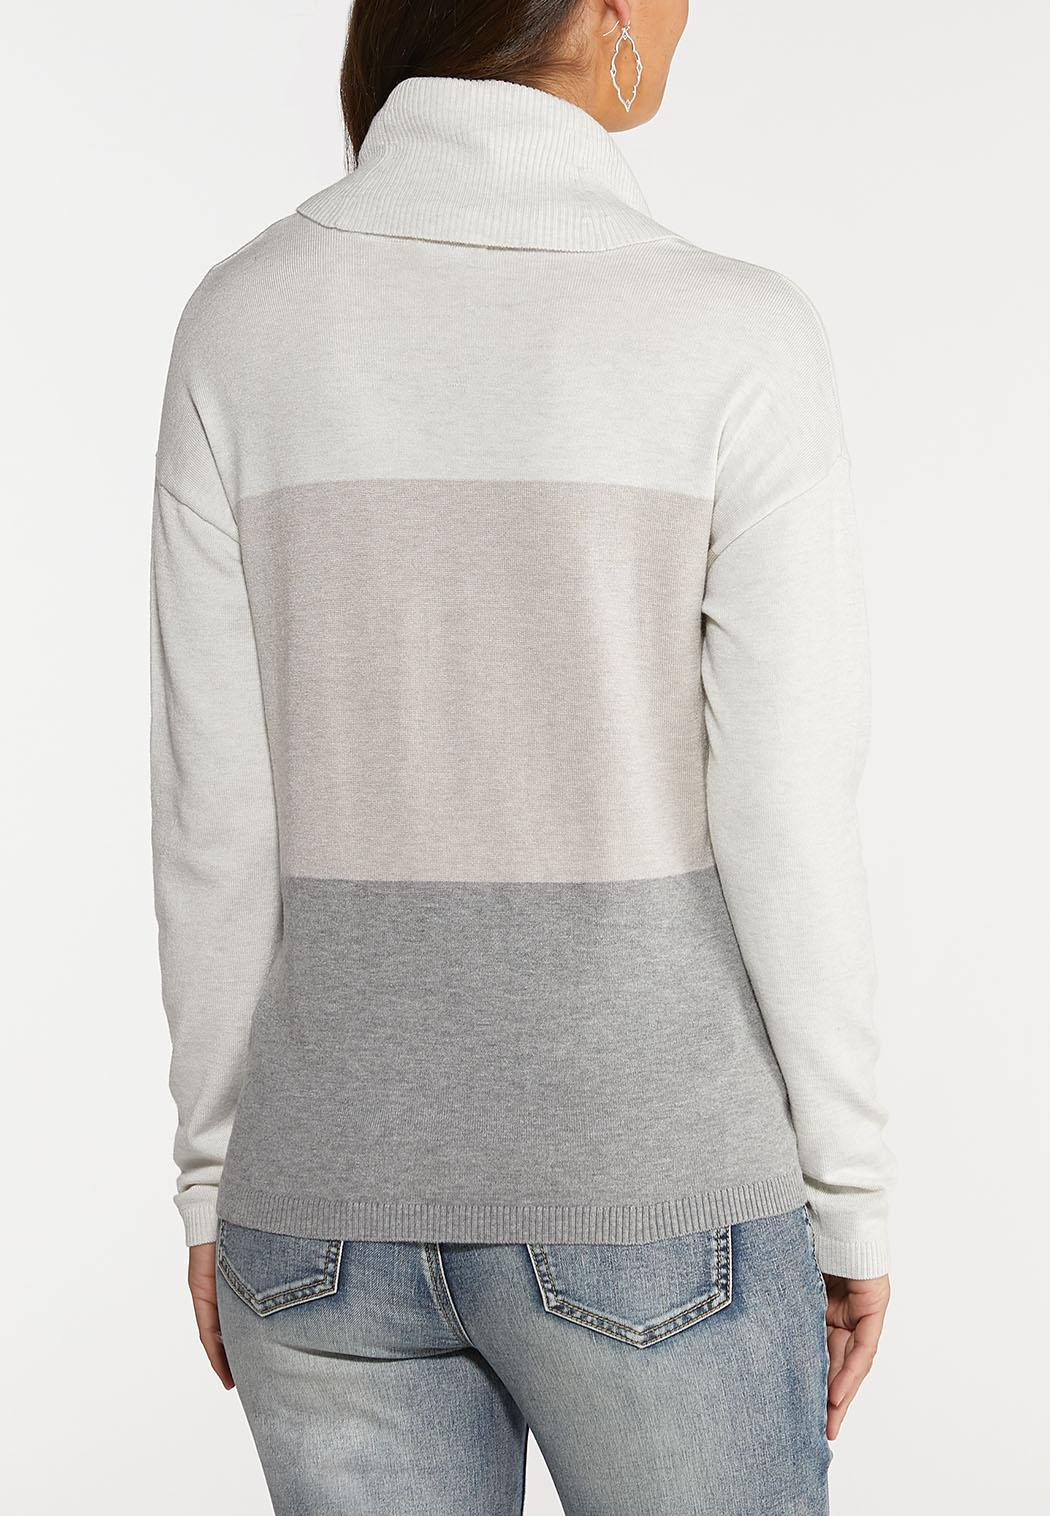 Colorblock Cowl Neck Sweater (Item #43990777)